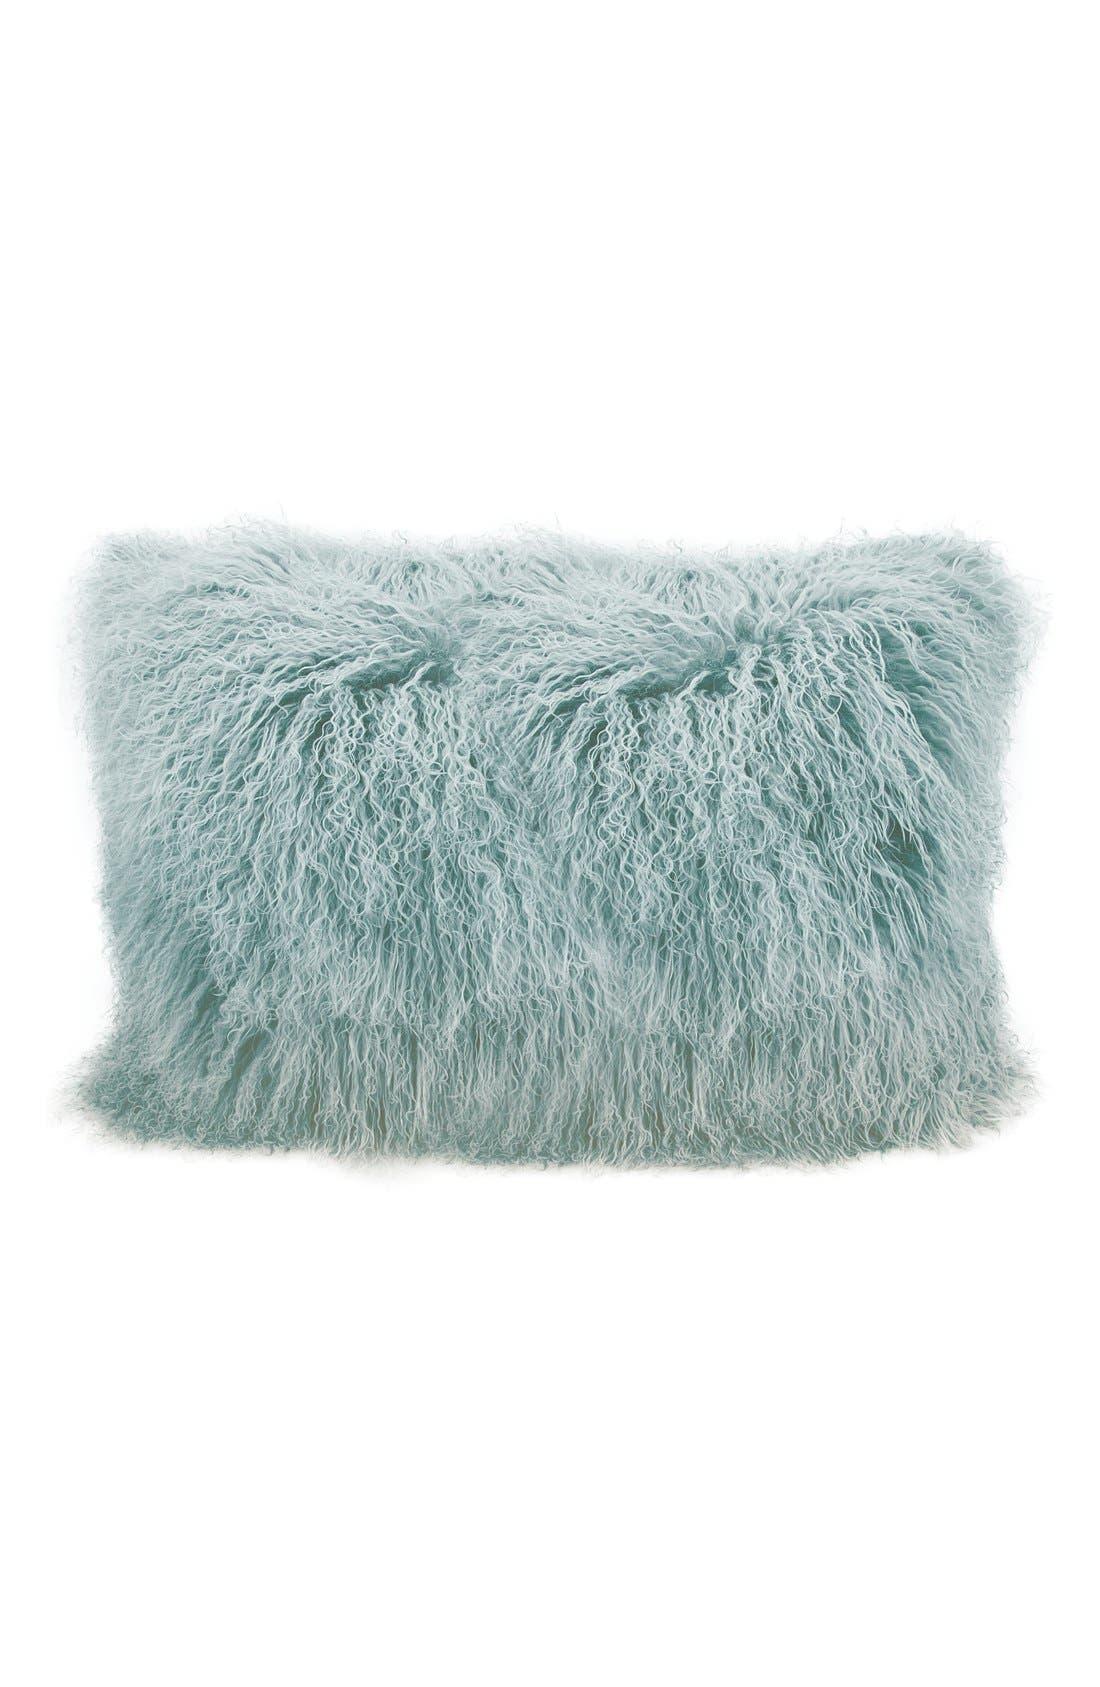 Alternate Image 1 Selected - Mina Victory Genuine Tibetan Shearling Pillow